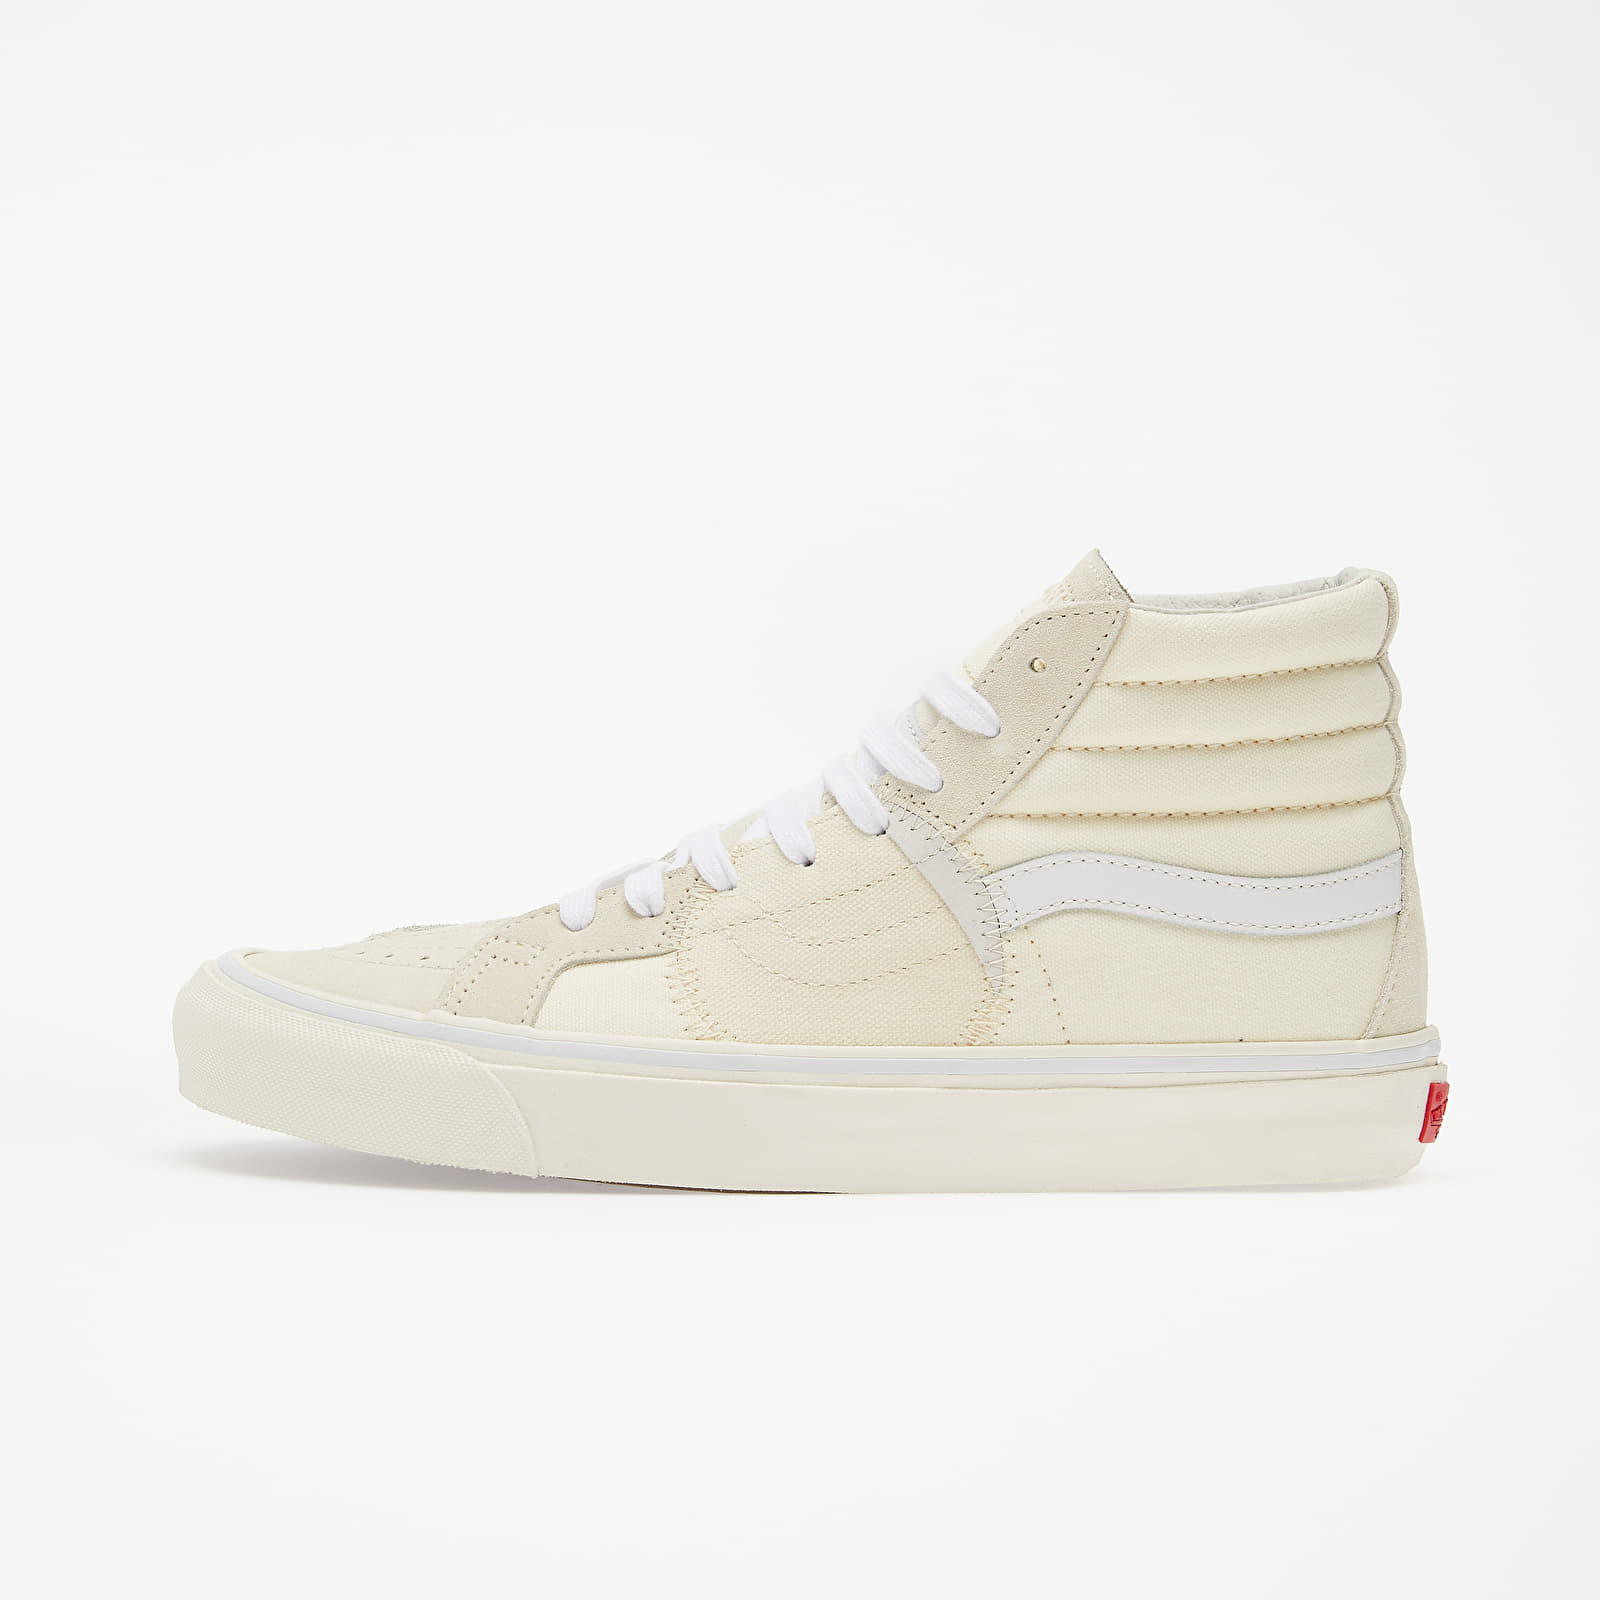 Pánske tenisky a topánky Vans SK8-Hi Bricolage LX (Vintage) Classic White/ Marshmellow